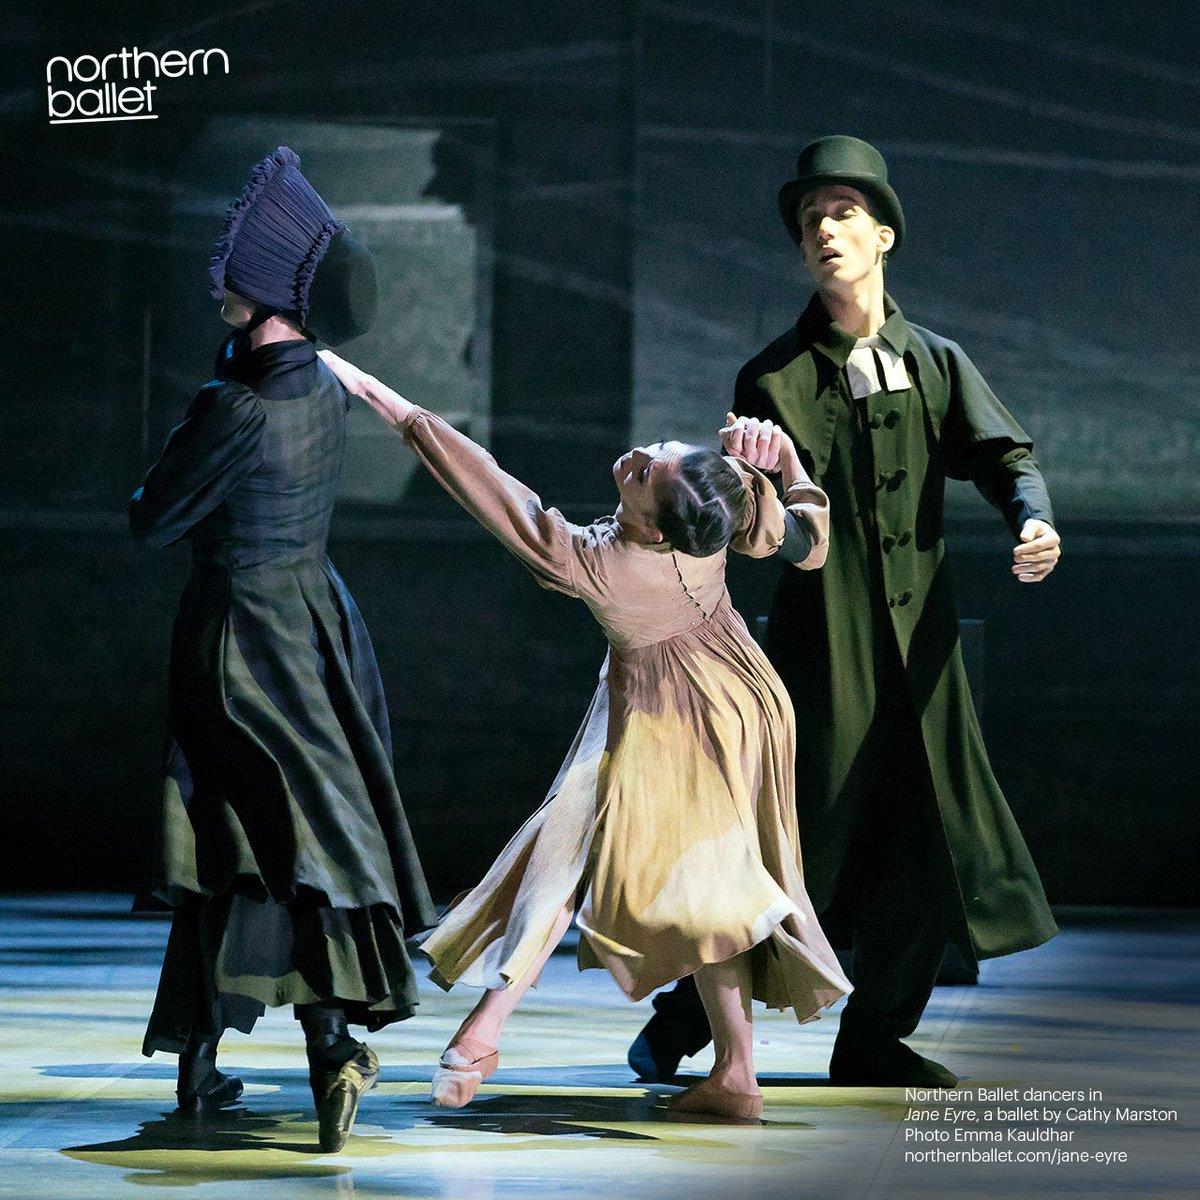 Northern Ballet on Twitter: